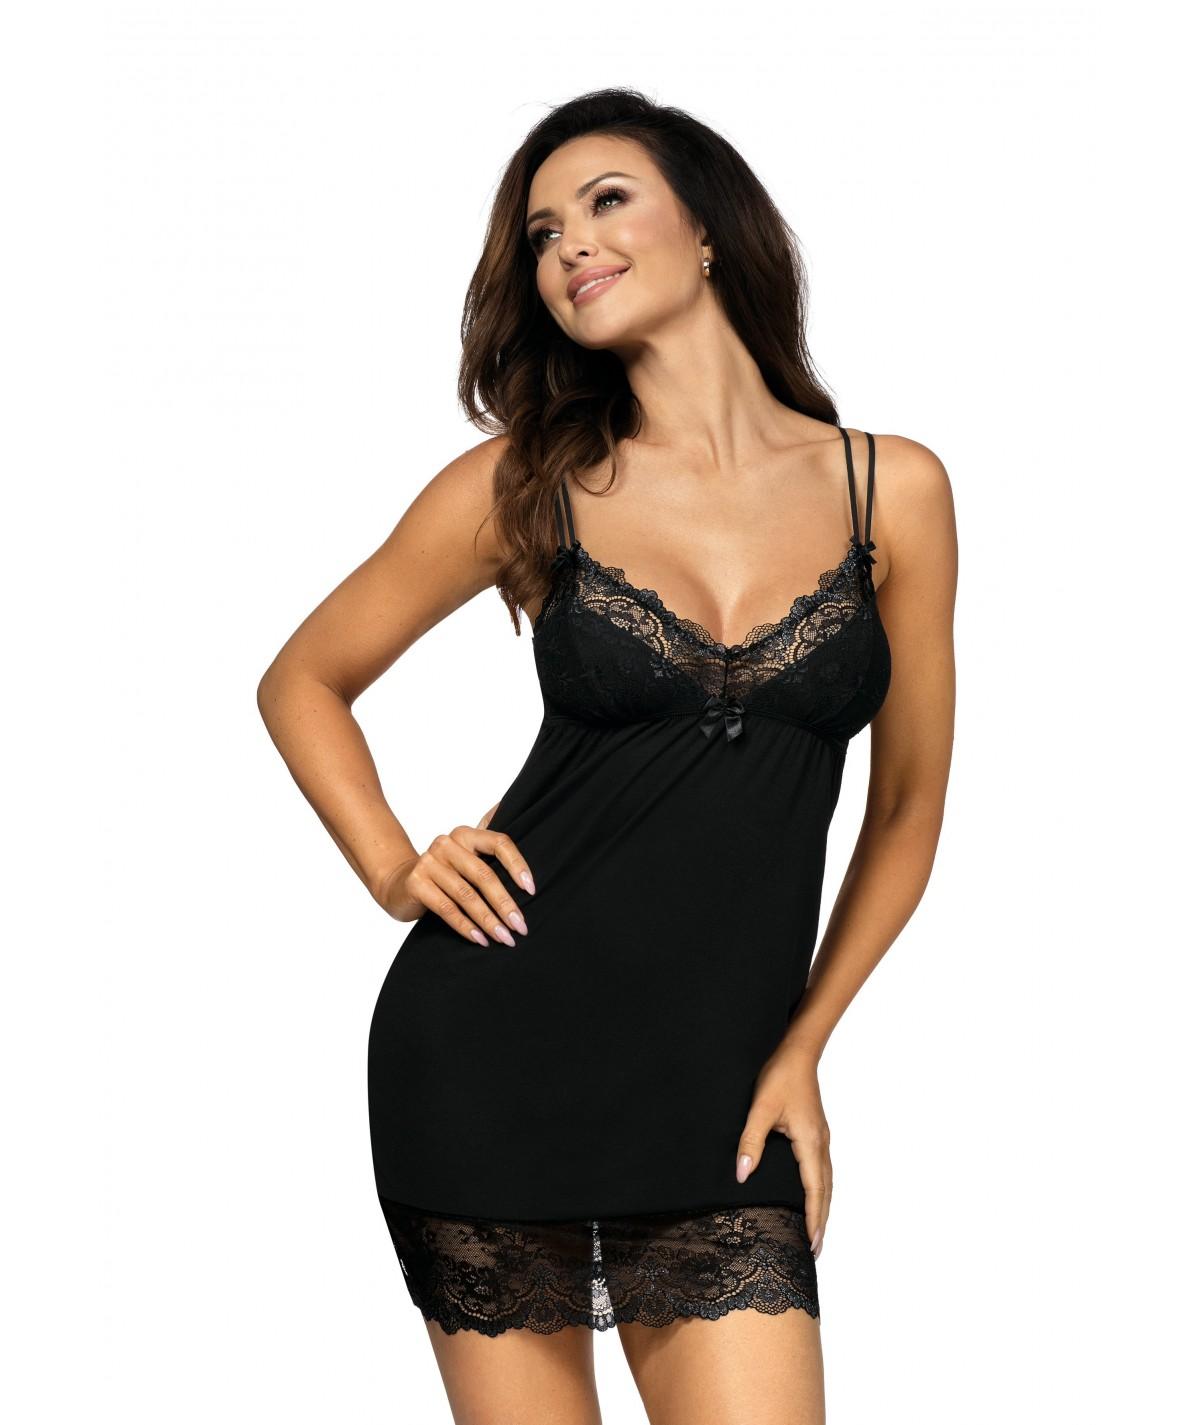 Koszulka nocna czarna Pamela  - DONNA